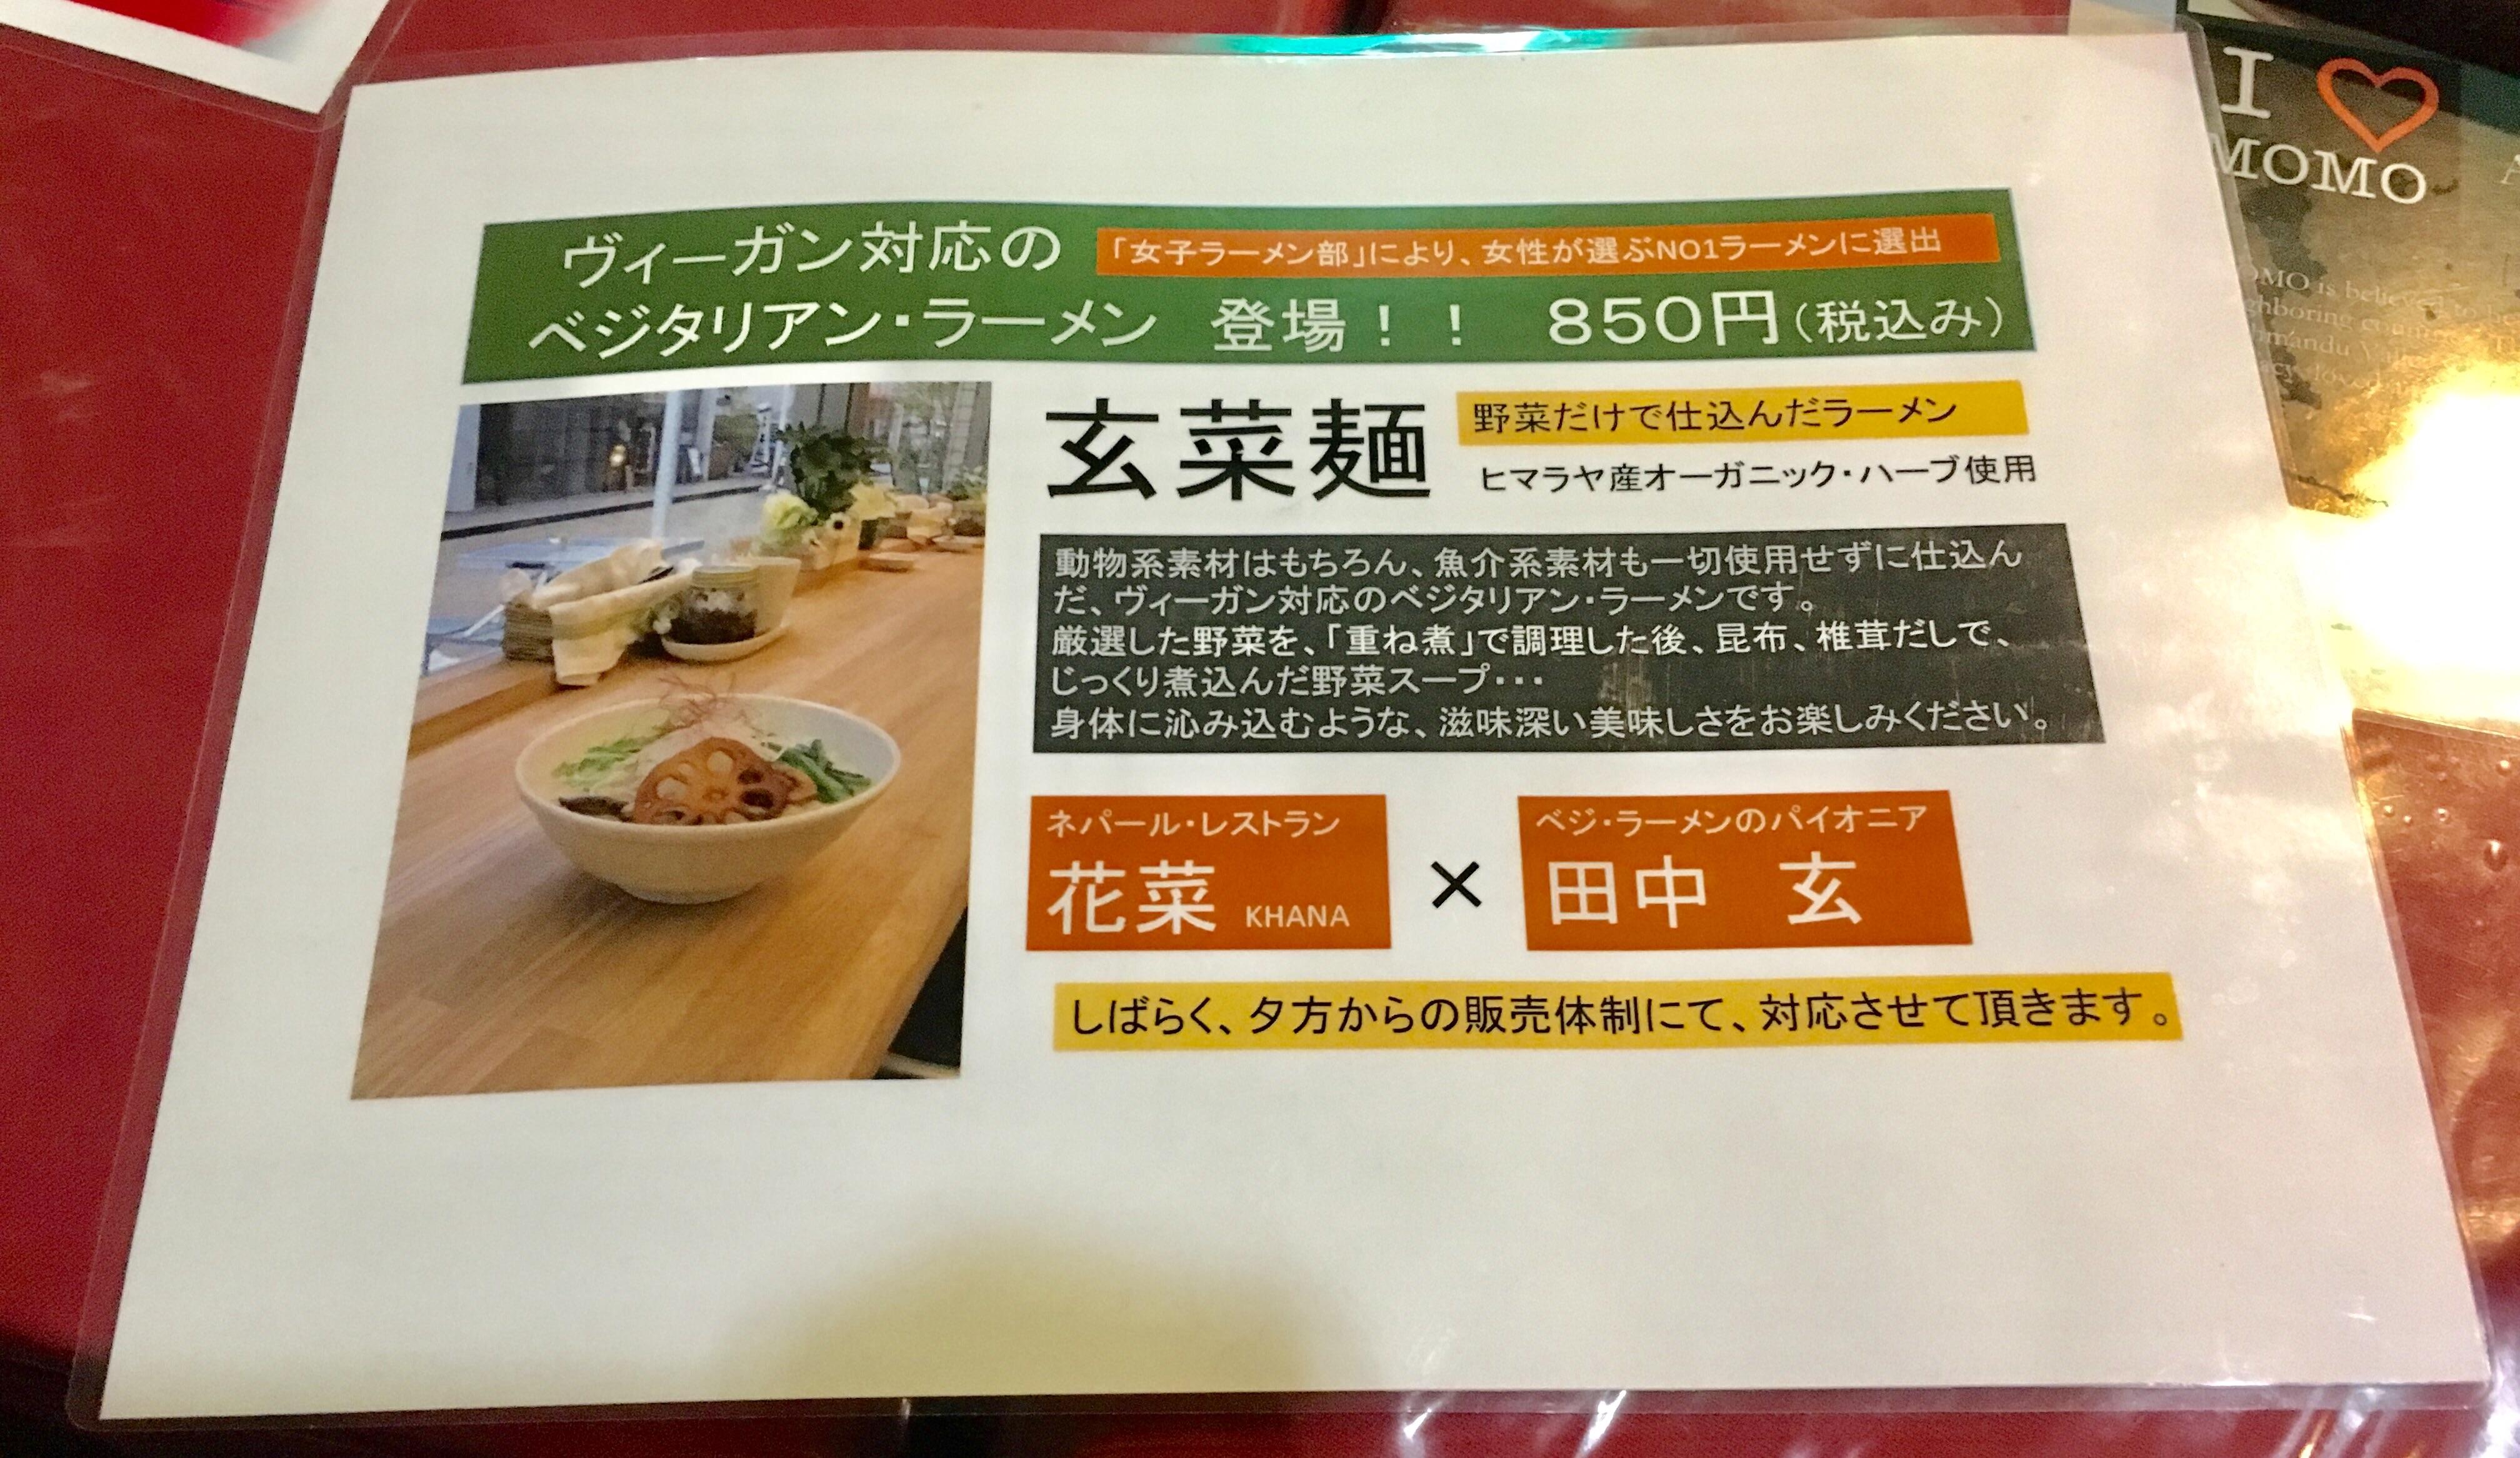 f:id:SoichiroIkeshita:20170130224615j:image